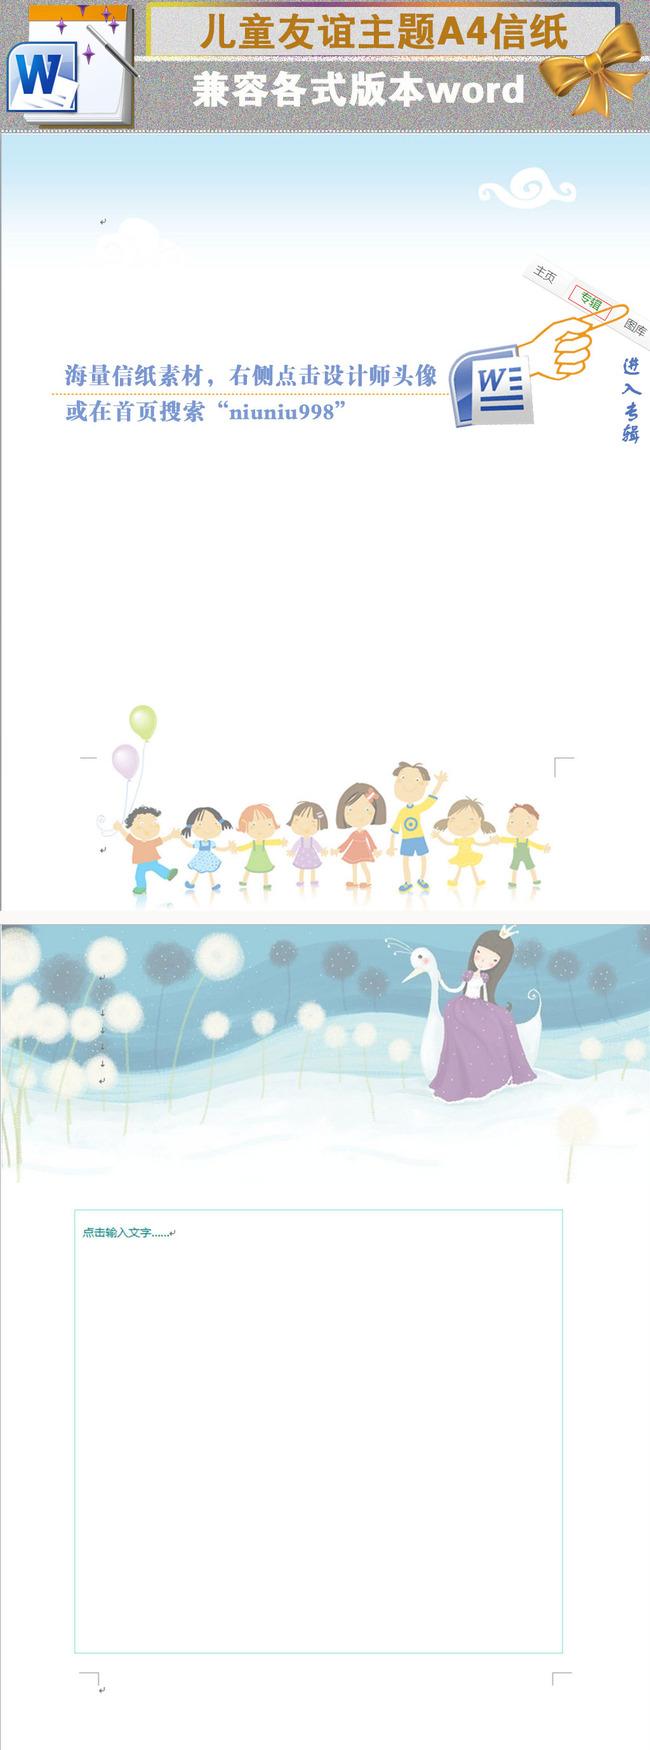 【doc】可爱卡通儿童友谊主题a4信纸模板